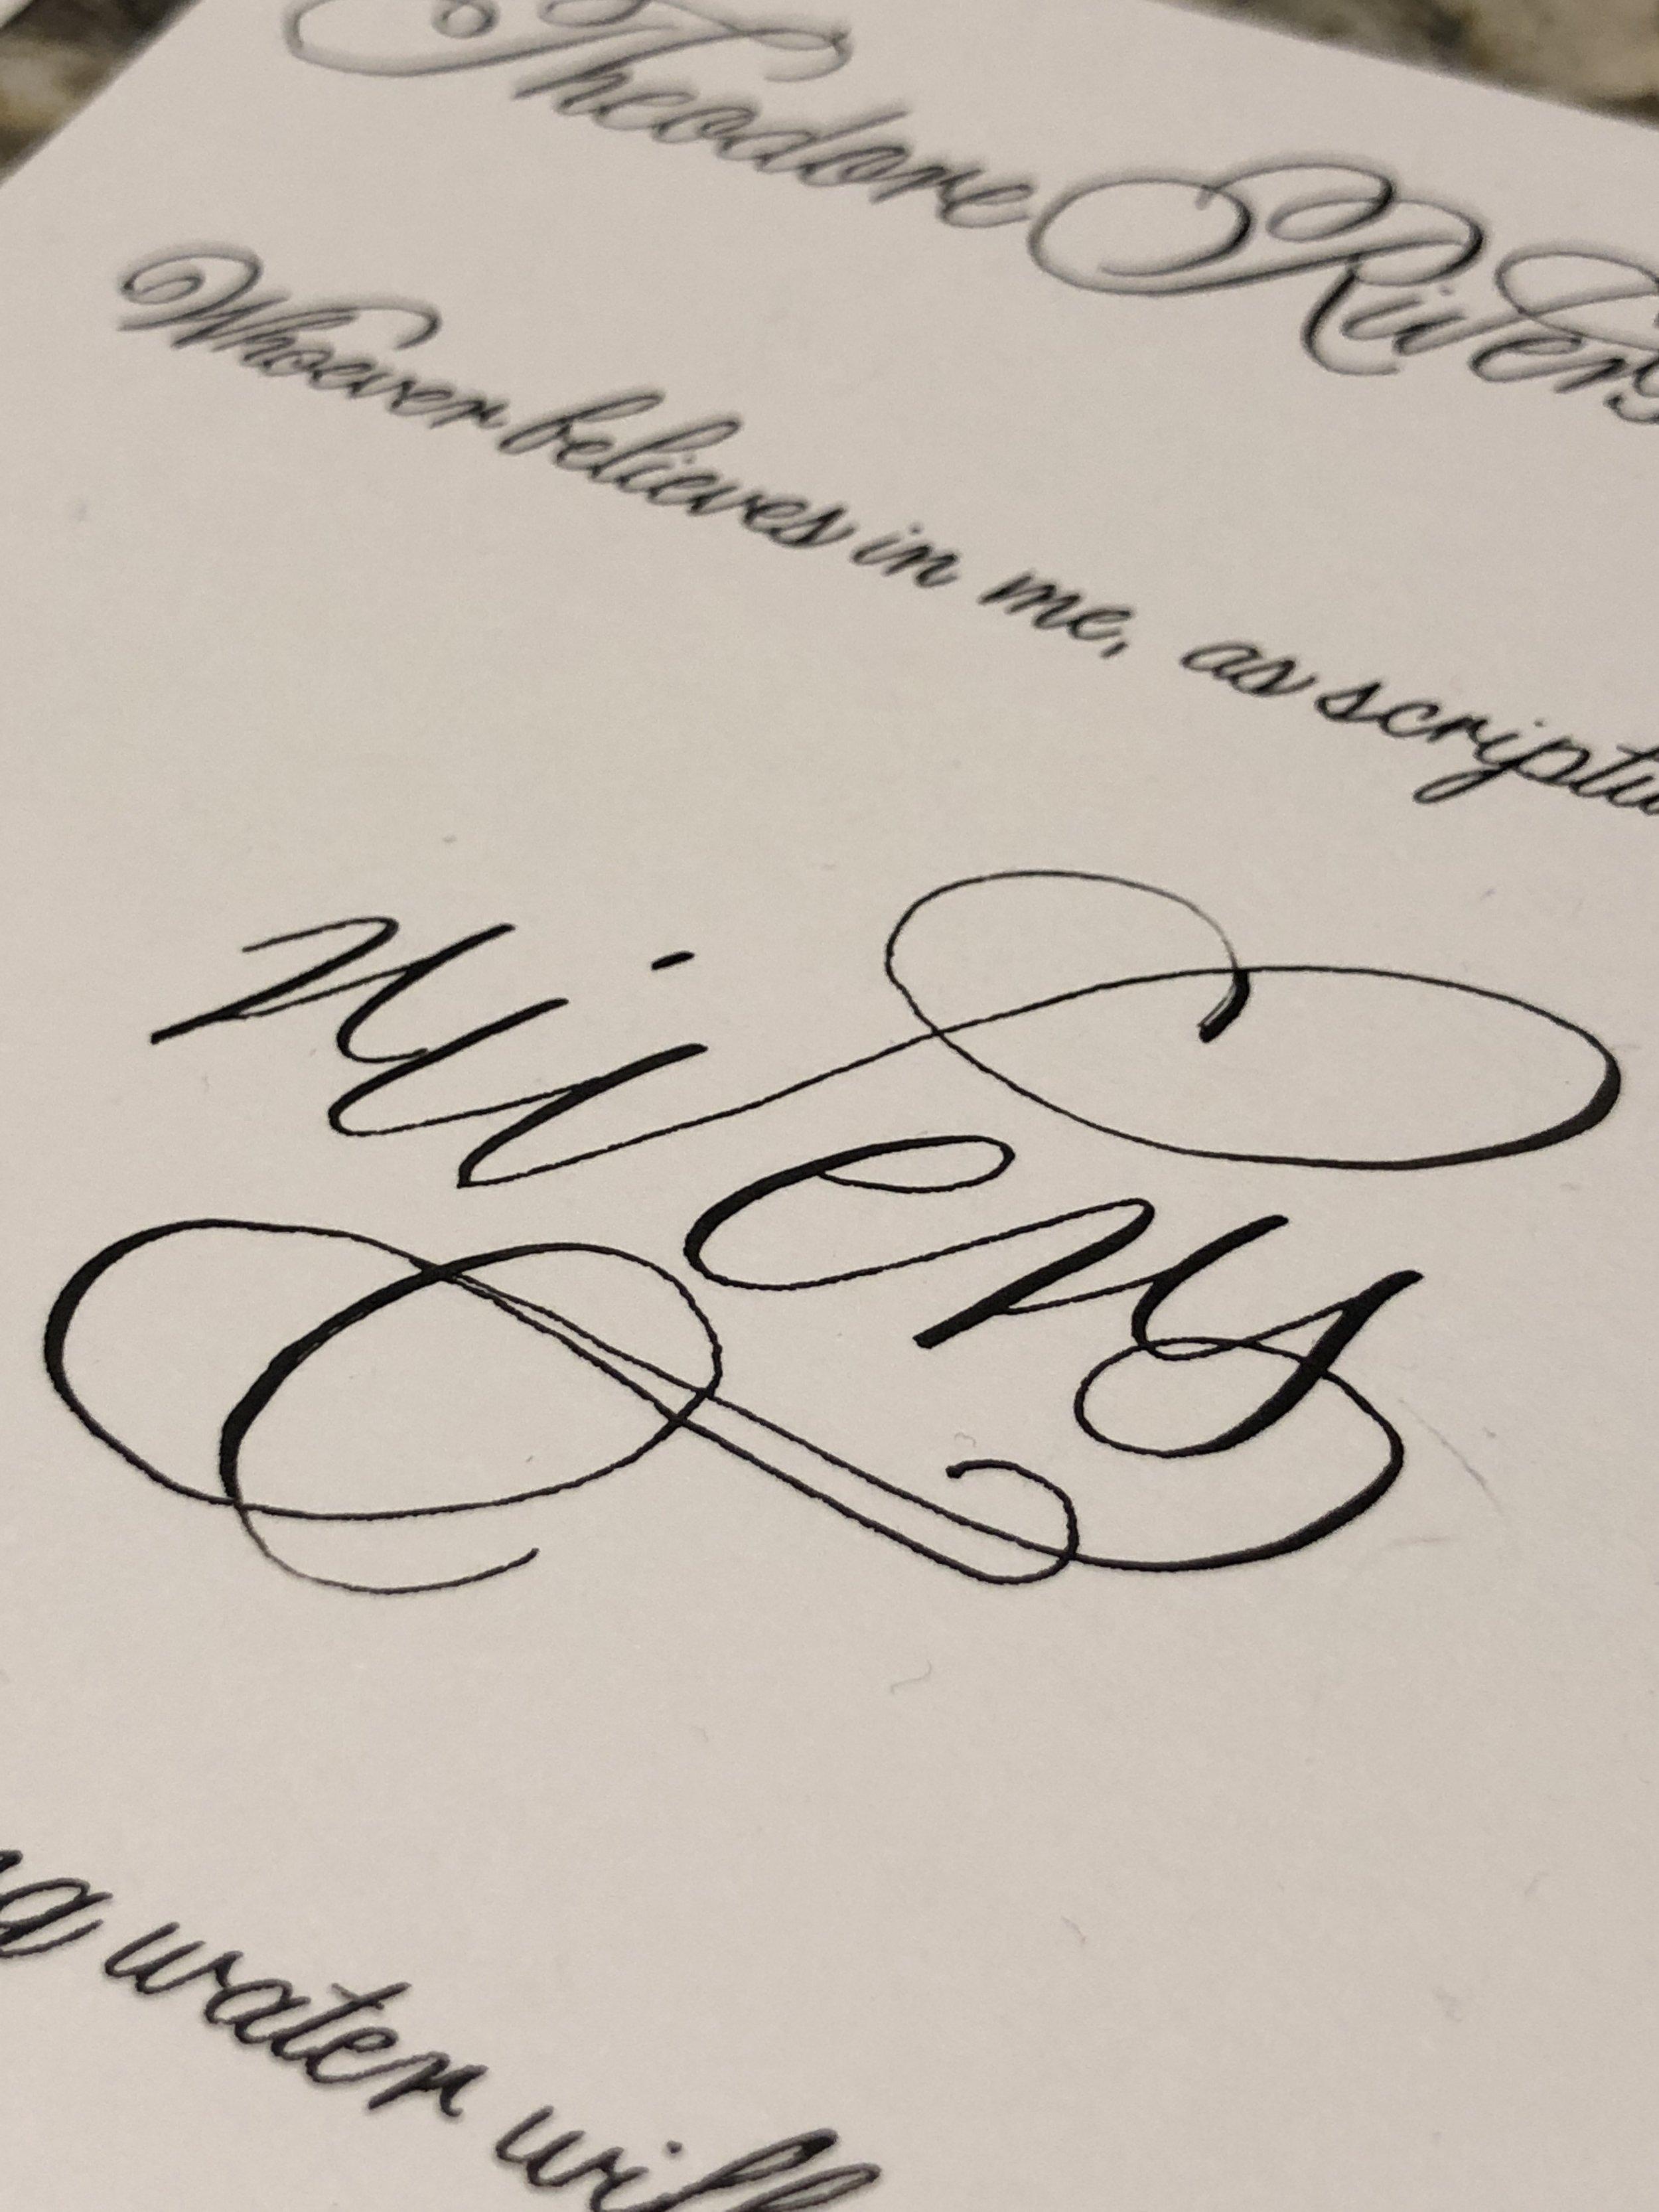 Central PA, York PA, JesSmith Designs, custom, wedding, invitations, bridal, Harrisburg, hanover, calligraphy, baltimore, wedding invitations, lancaster, gettysburg, 06-27 20.00.10.jpg